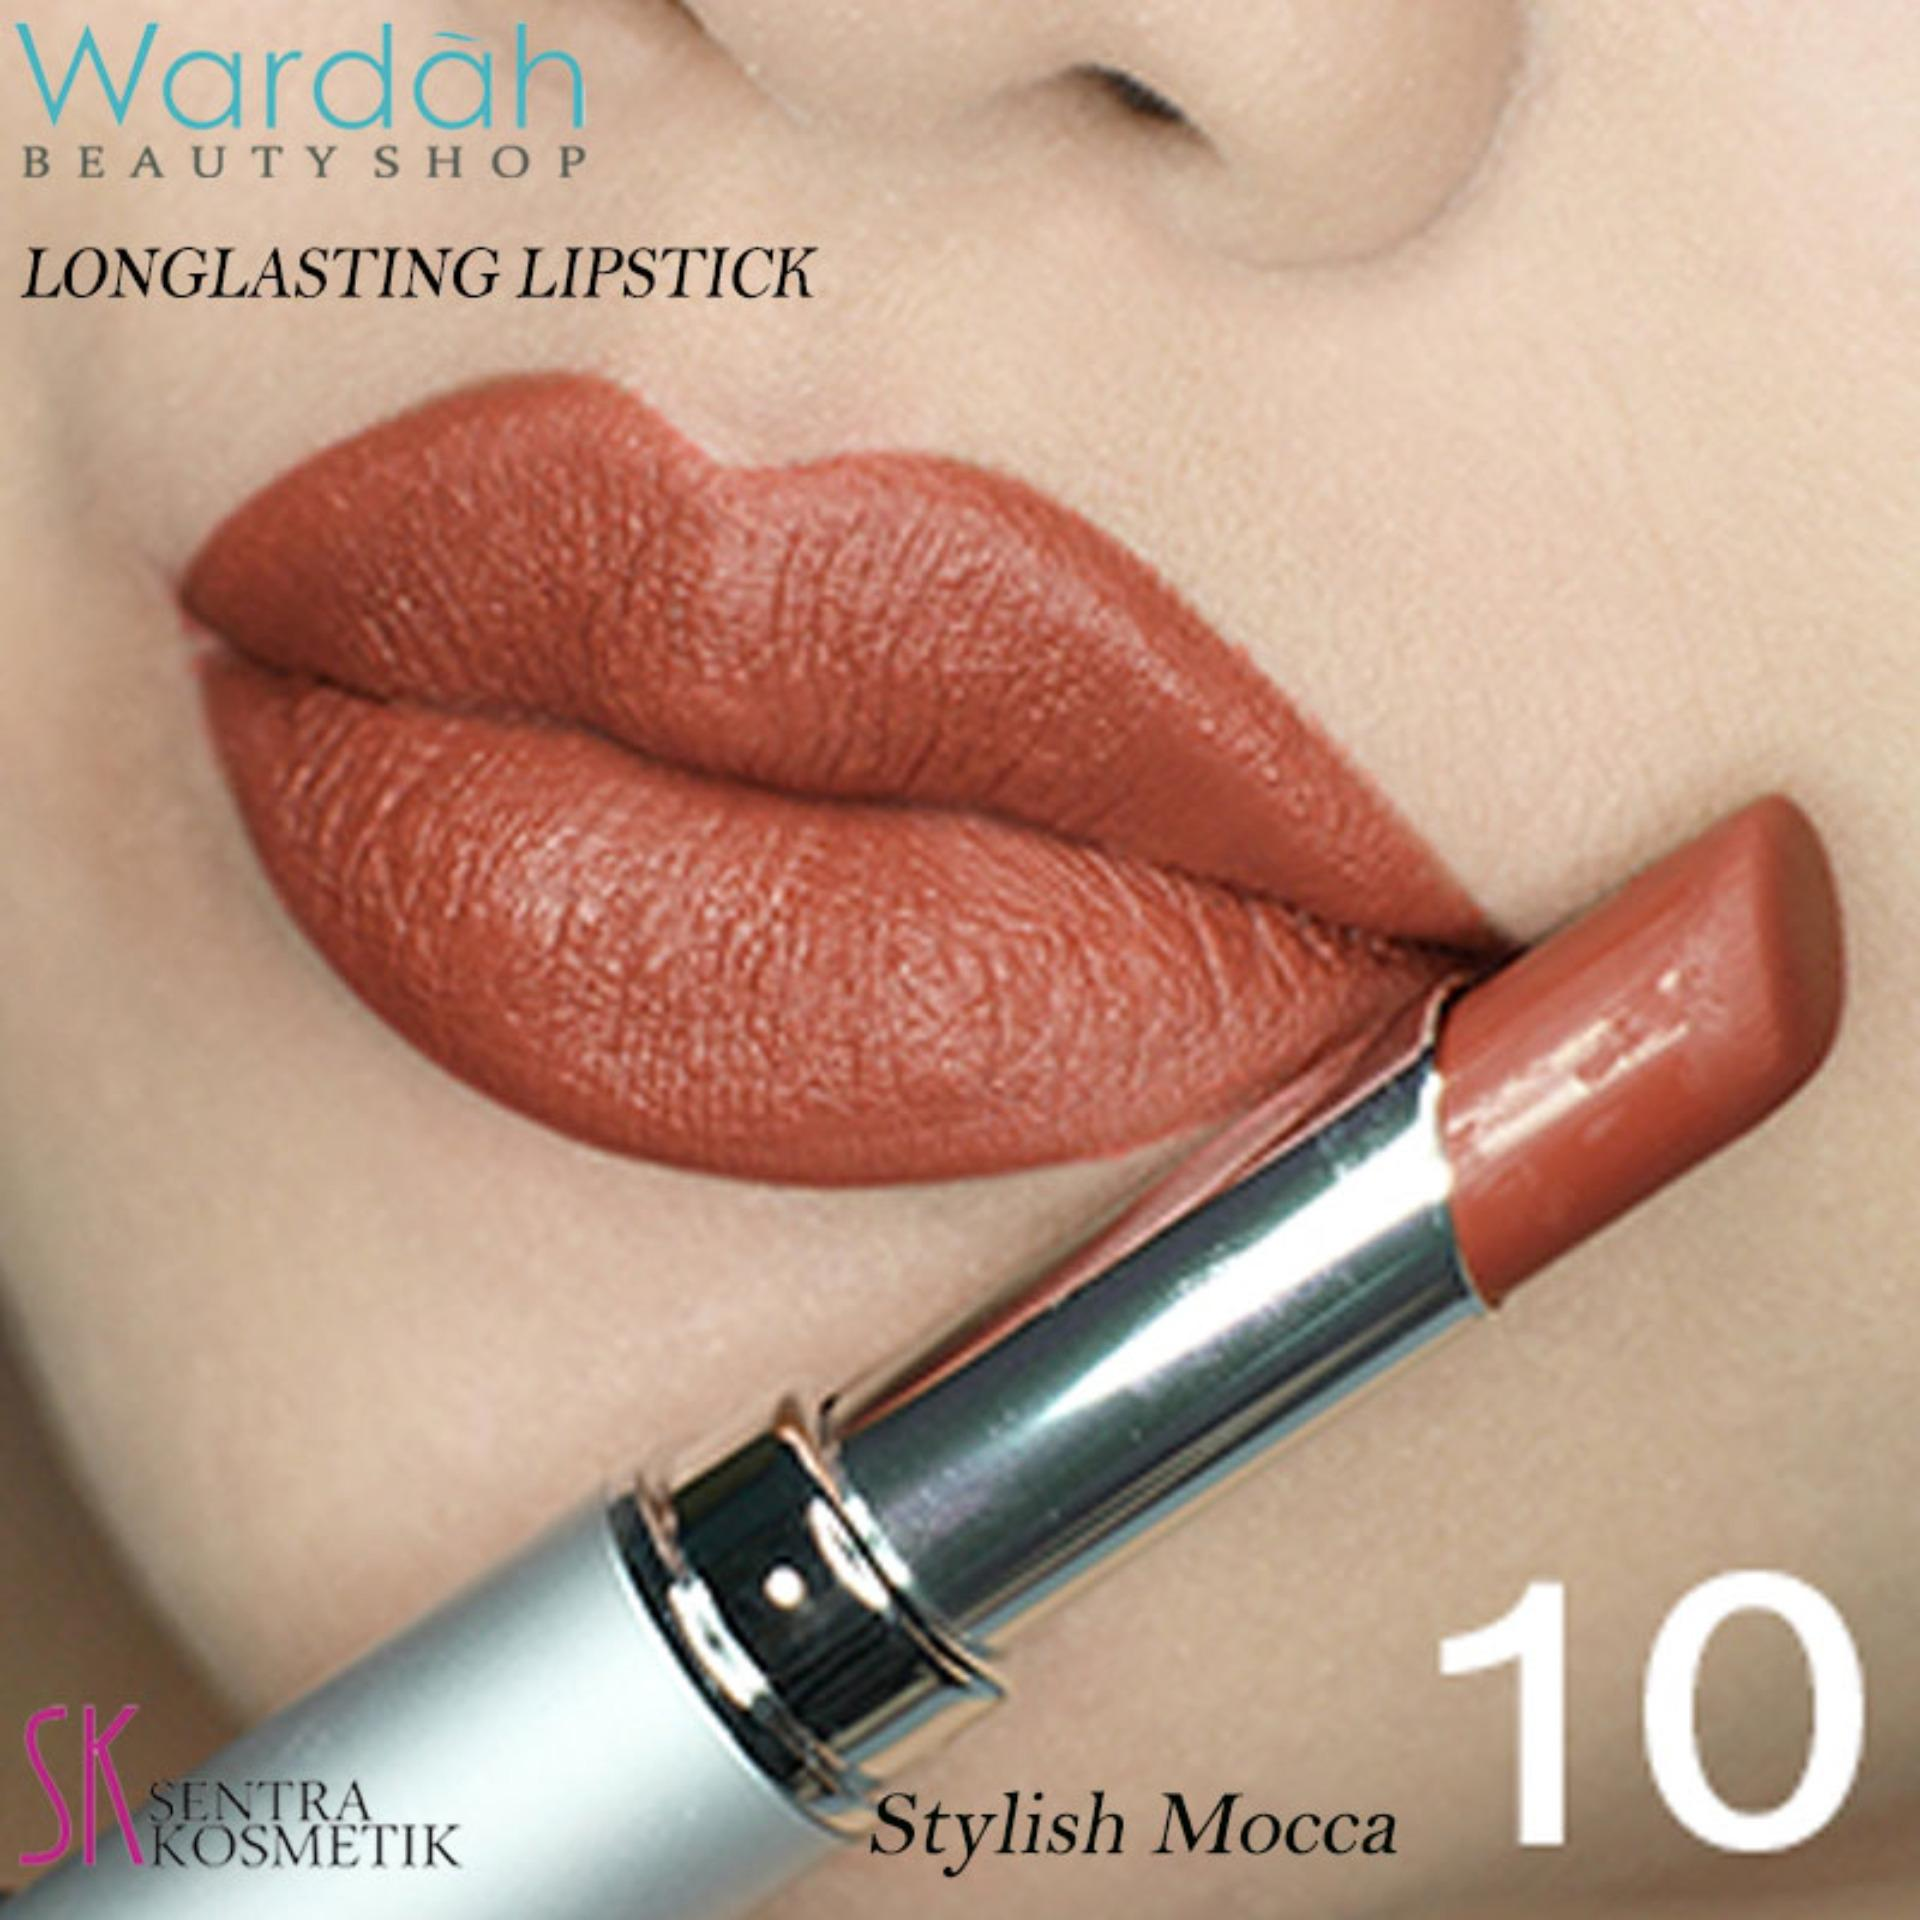 Wardah LONGLASTING Lipstick No.10 Stylish Mocca